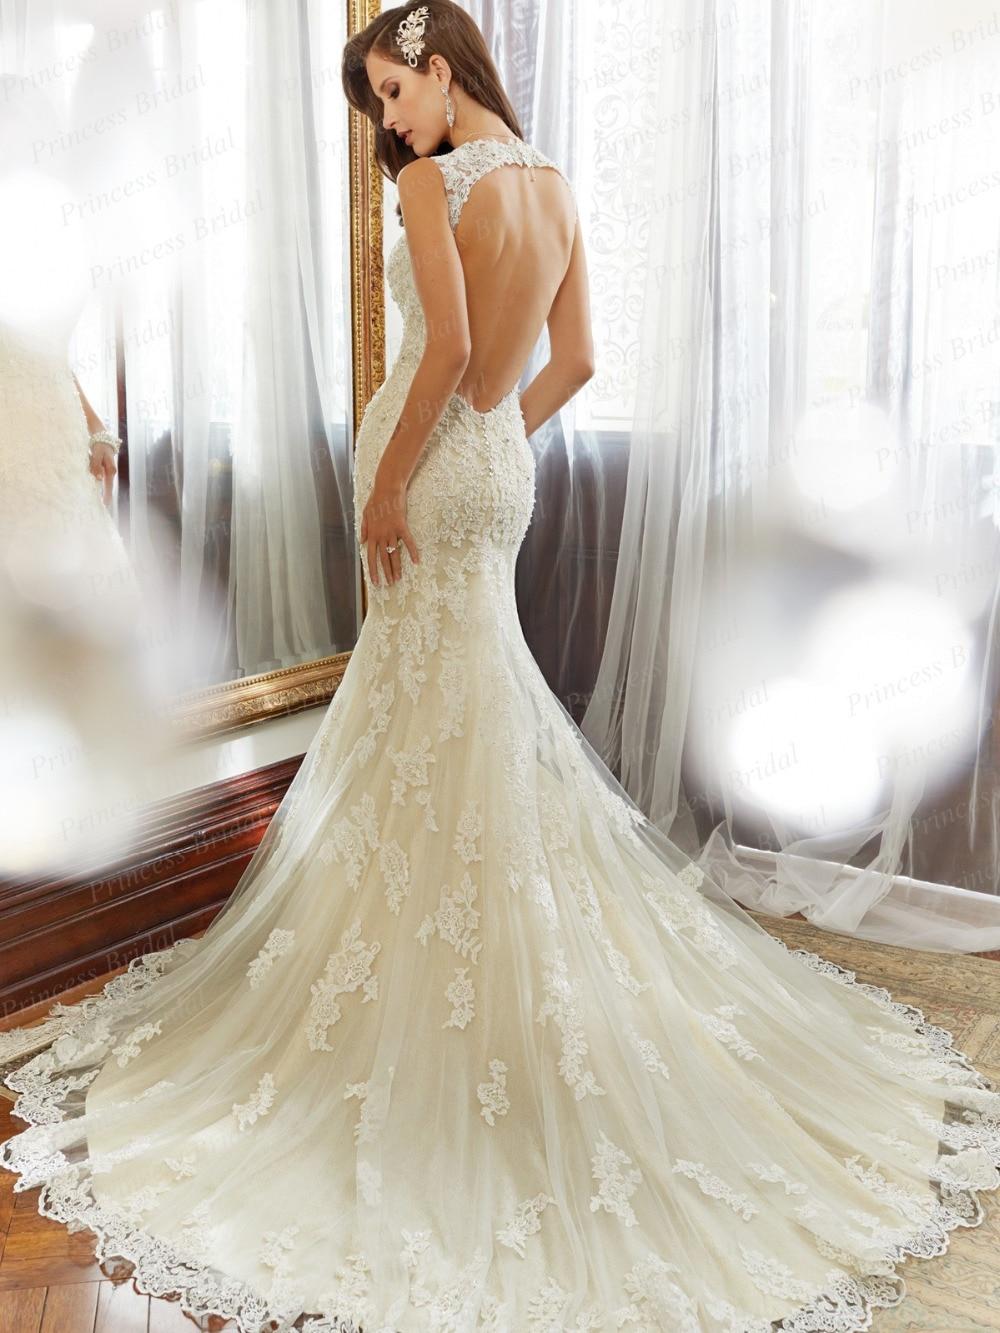 strapless lace open back wedding dress open back wedding dresses strapless lace open back wedding dress